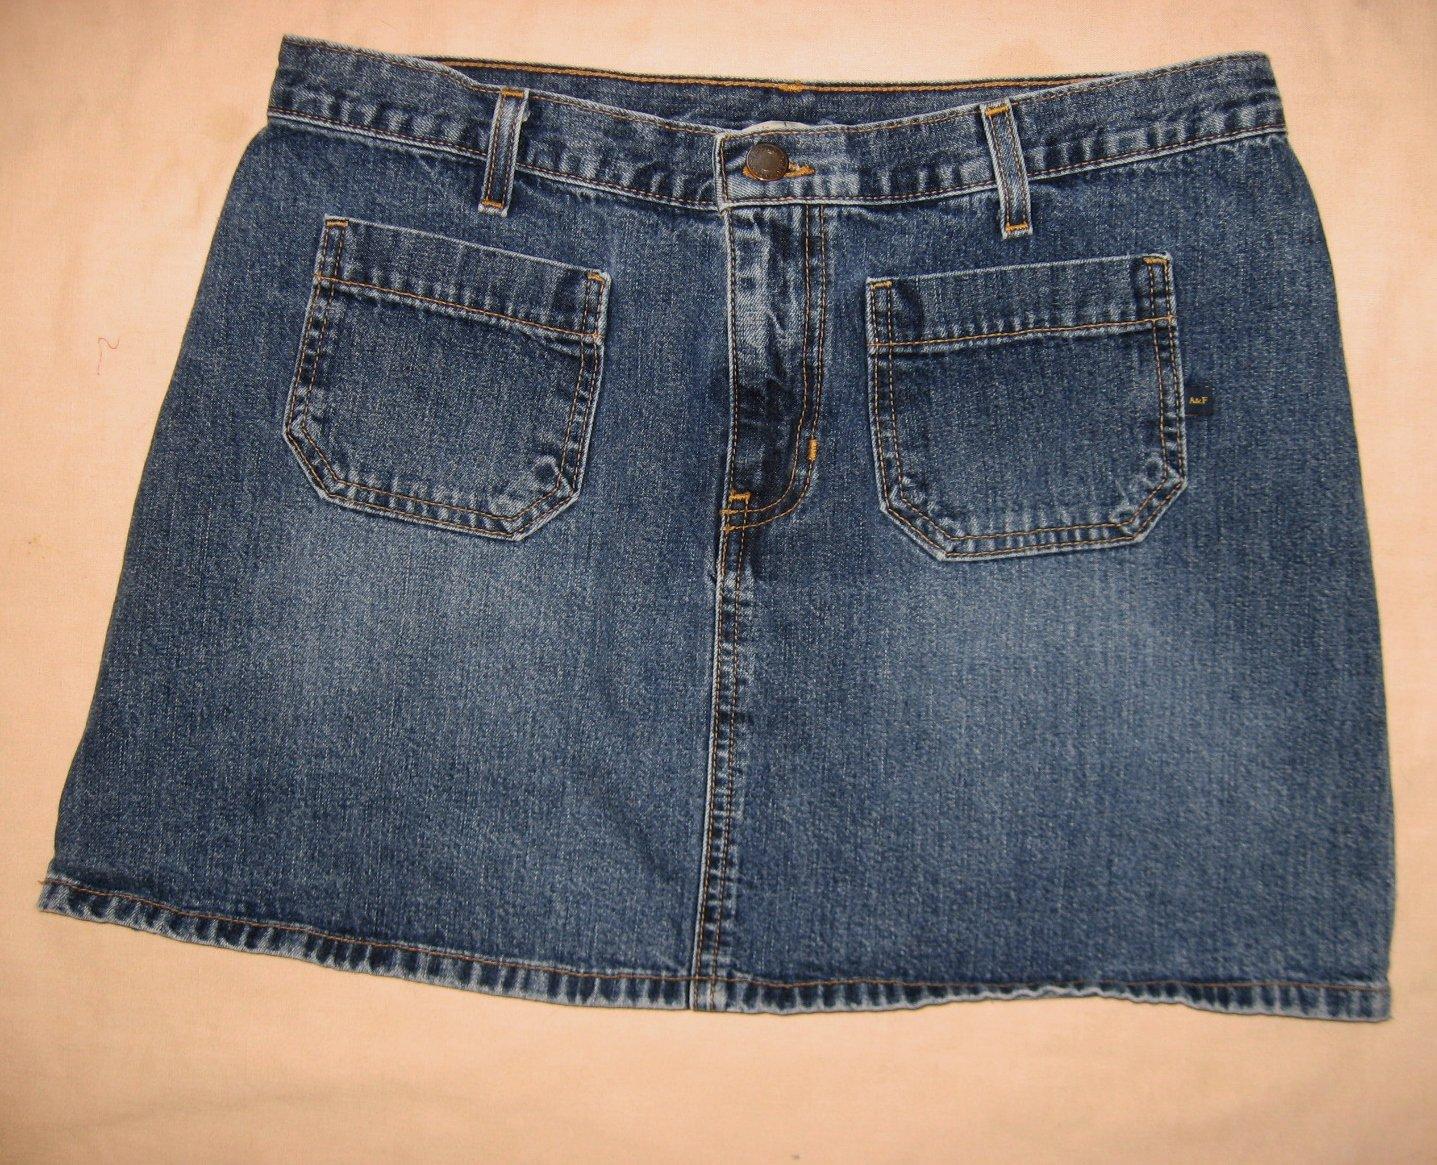 Abercrombie Fitch Jean Skirt 10 32 Waist EUC Mini Blue Denim